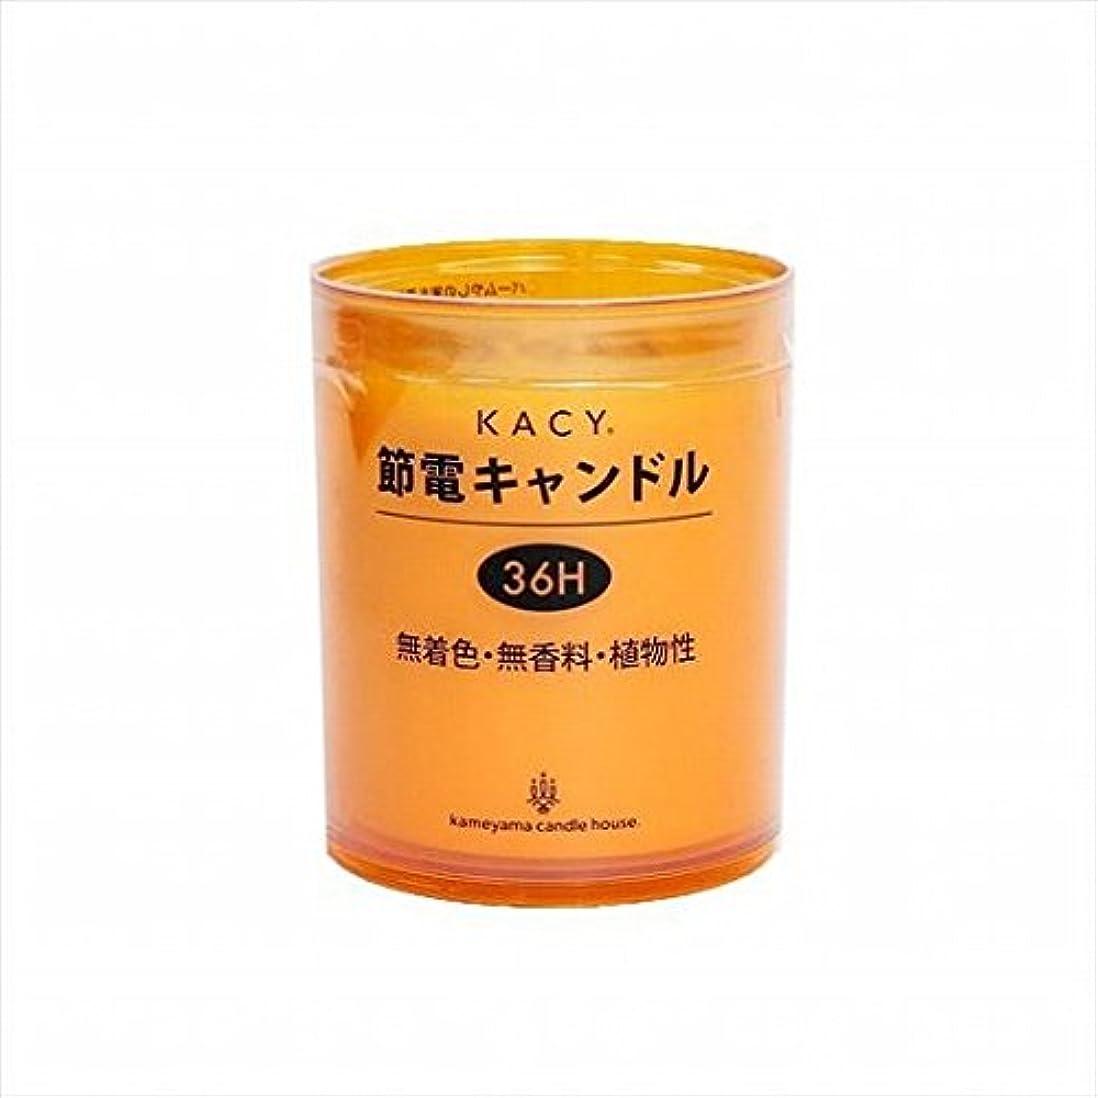 kameyama candle(カメヤマキャンドル) 節電キャンドル 36時間タイプ 「 オレンジ 」 キャンドル 83x83x100mm (A9610010OR)